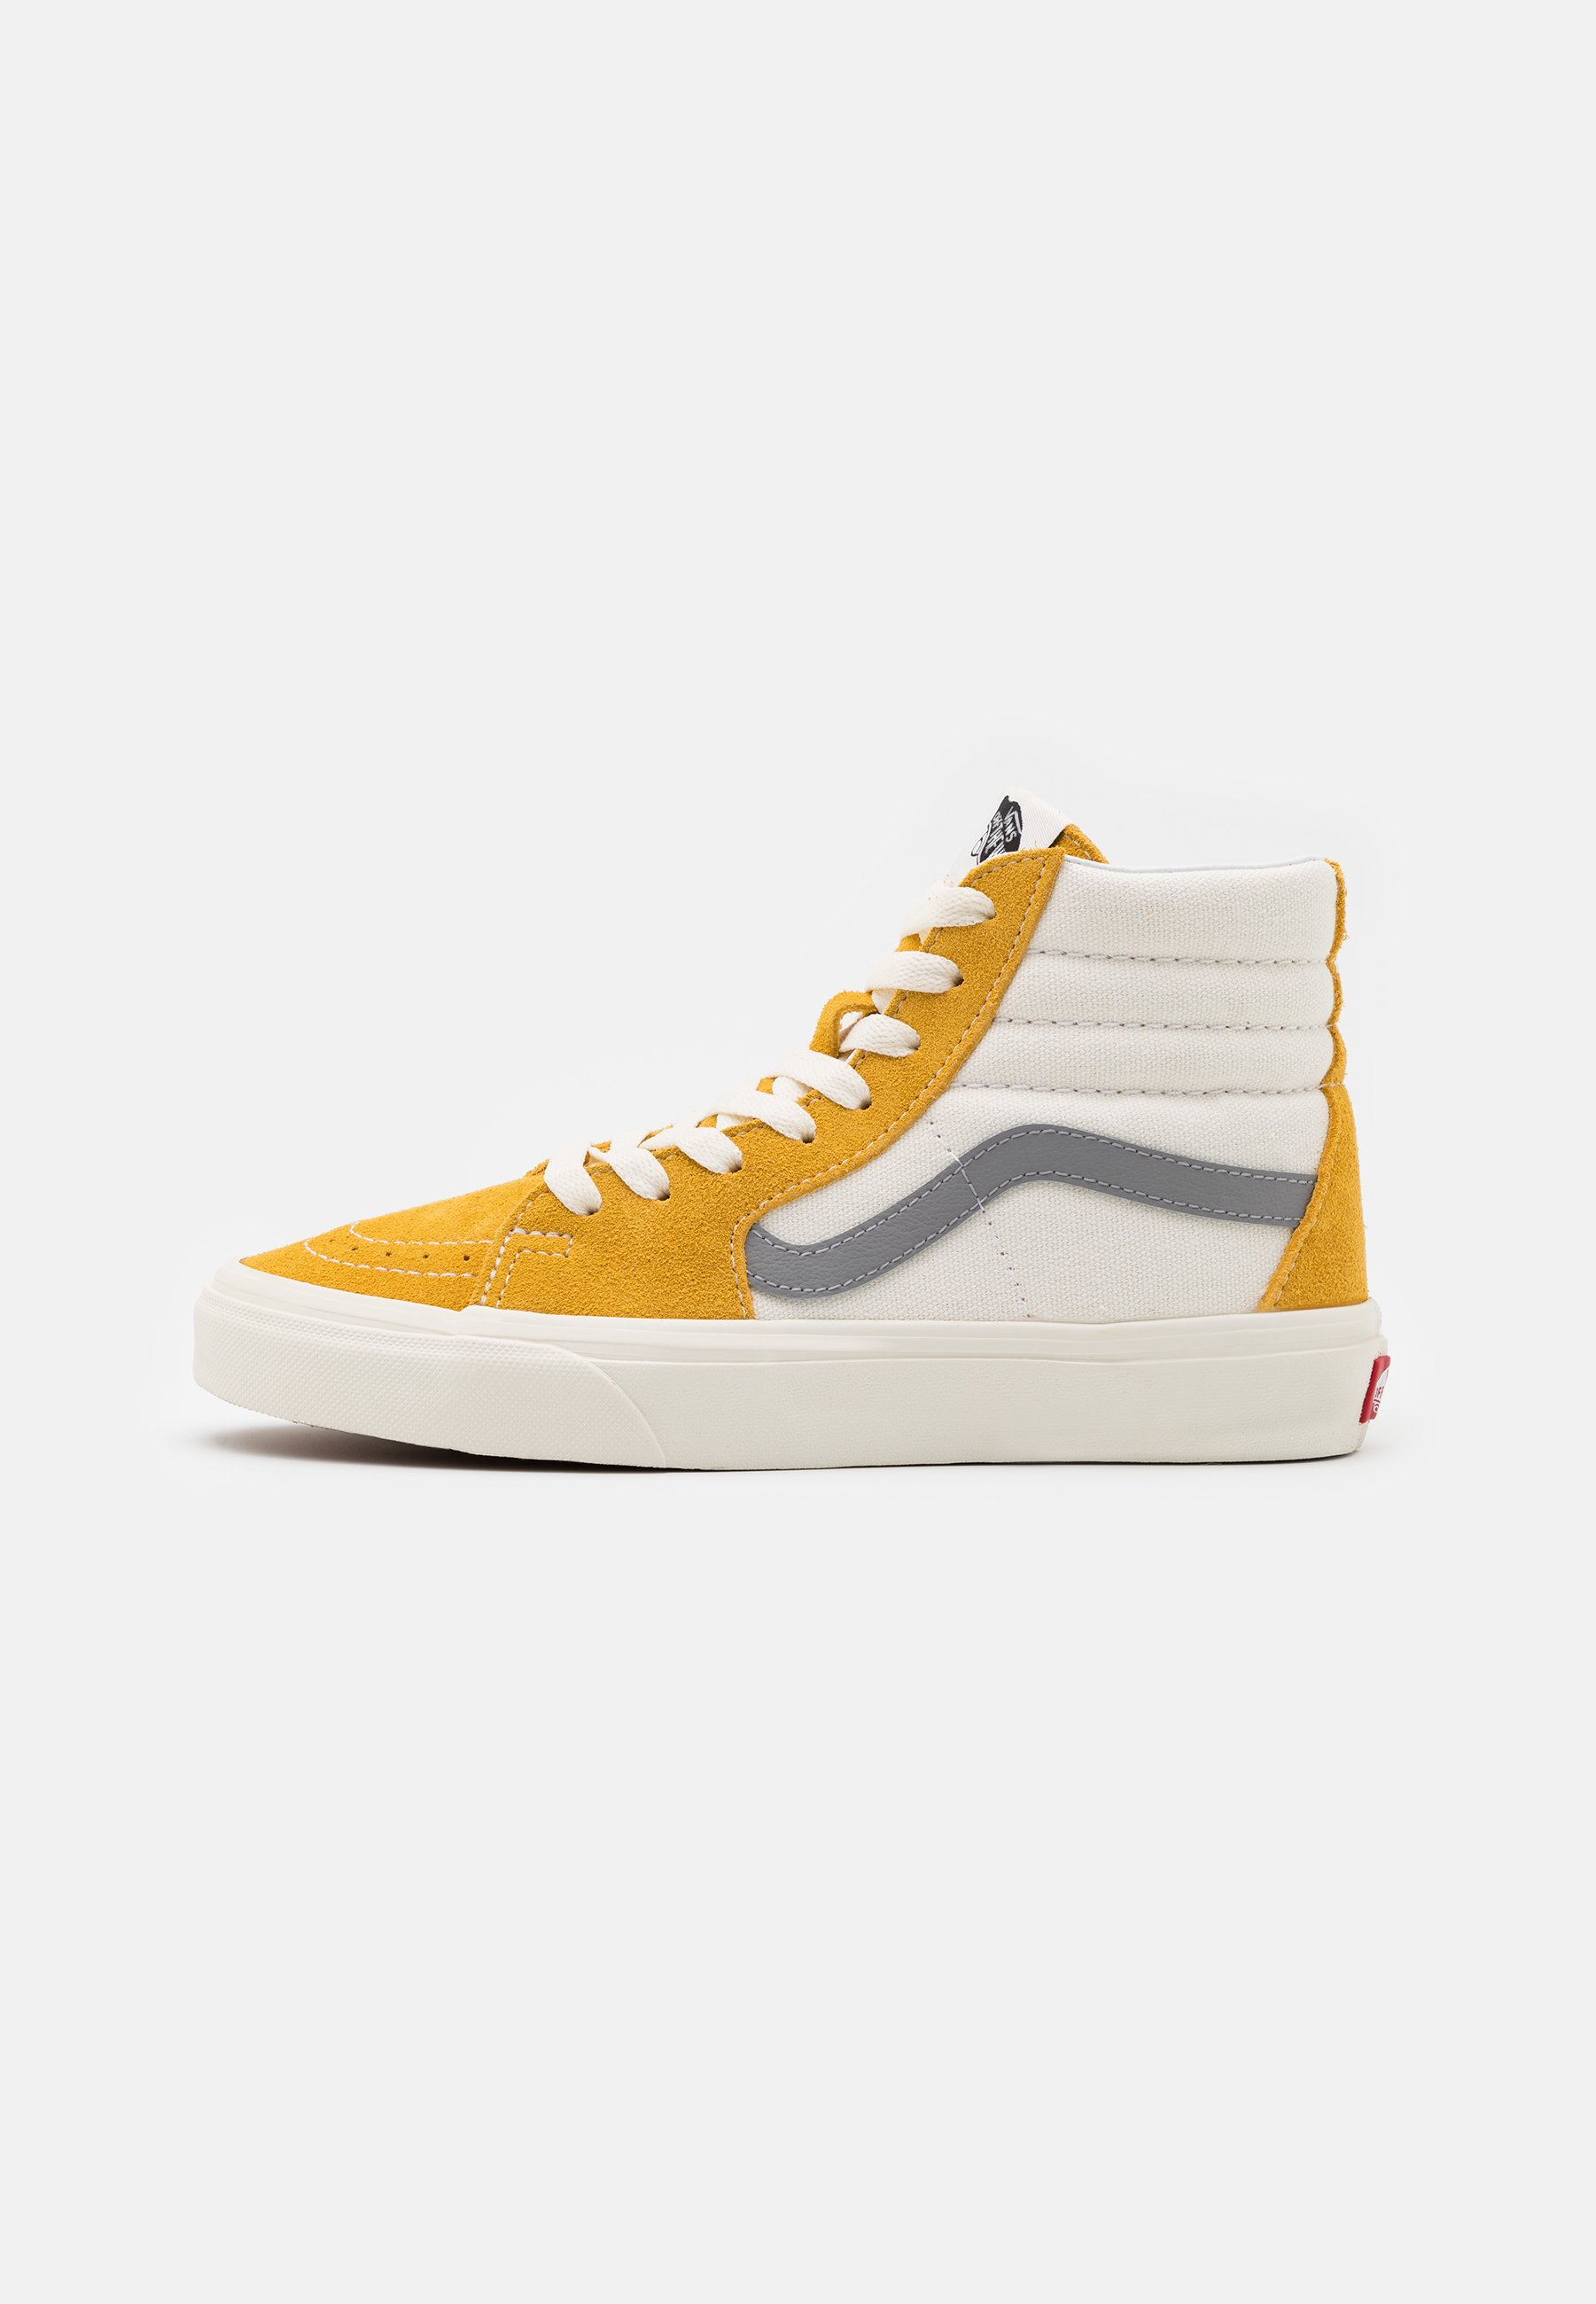 vans montante jaune, OFF 73%,where to buy!